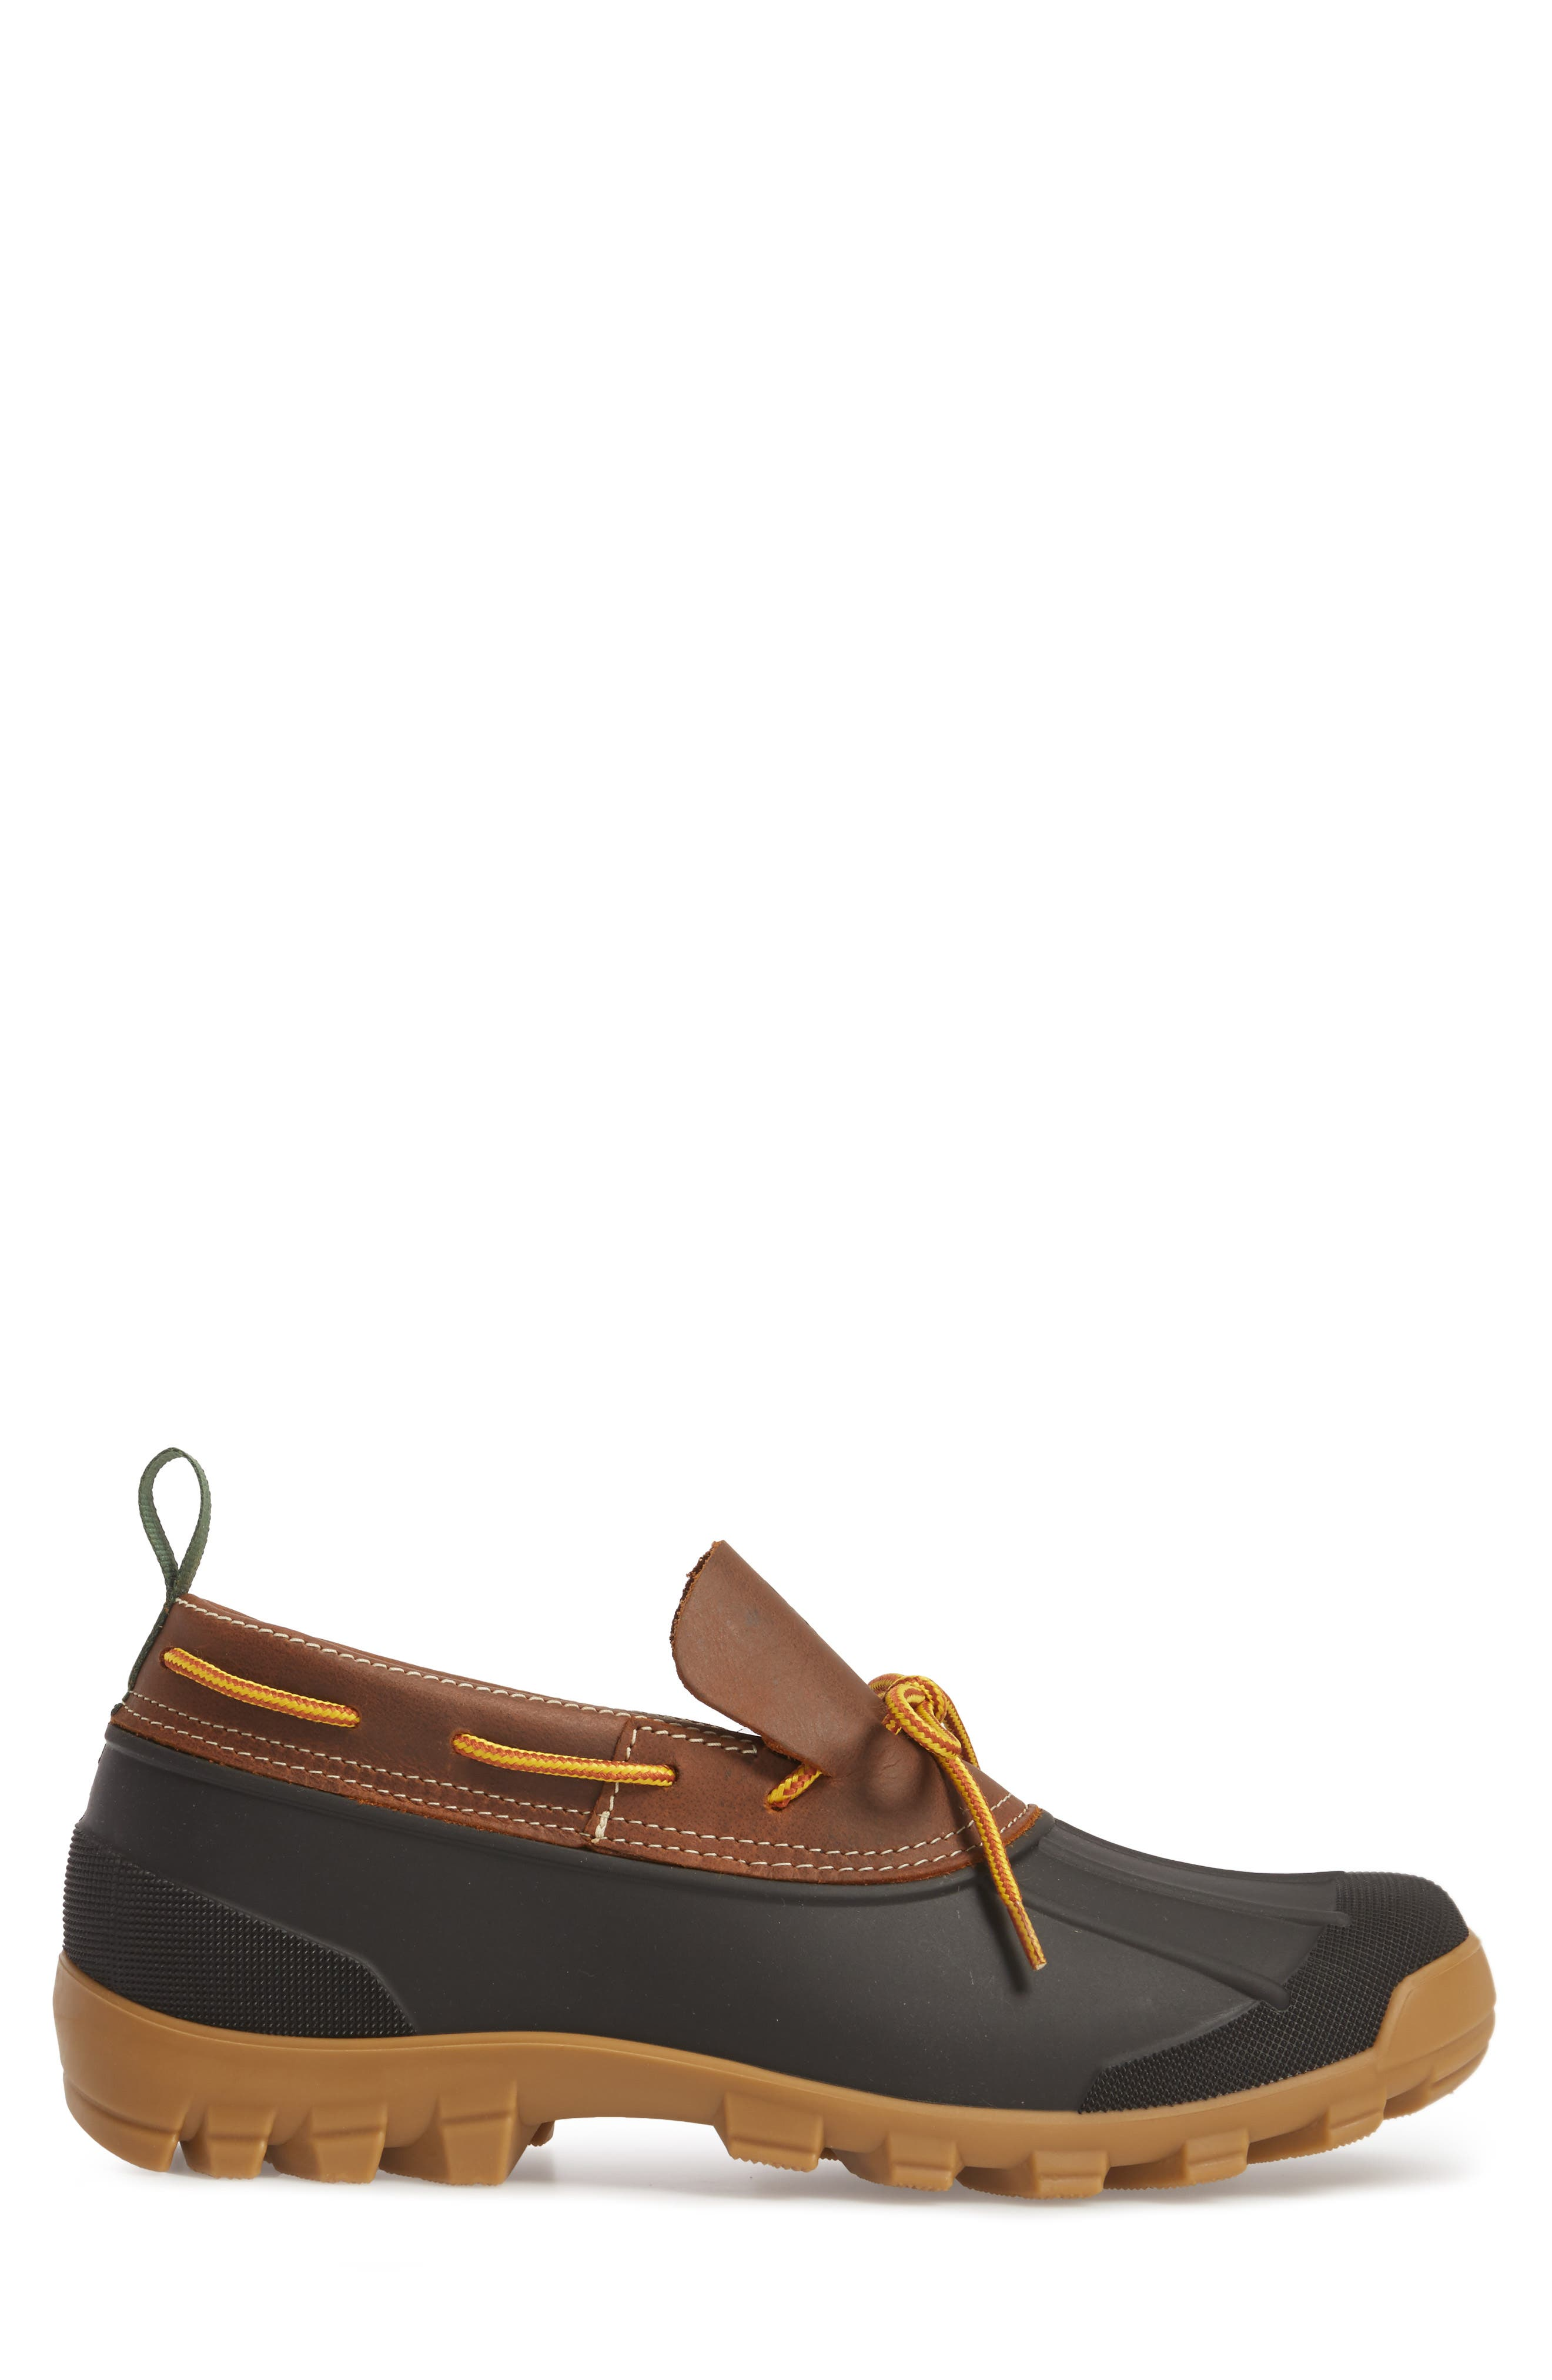 Yukon Short Boot,                             Alternate thumbnail 3, color,                             Dark Brown Leather